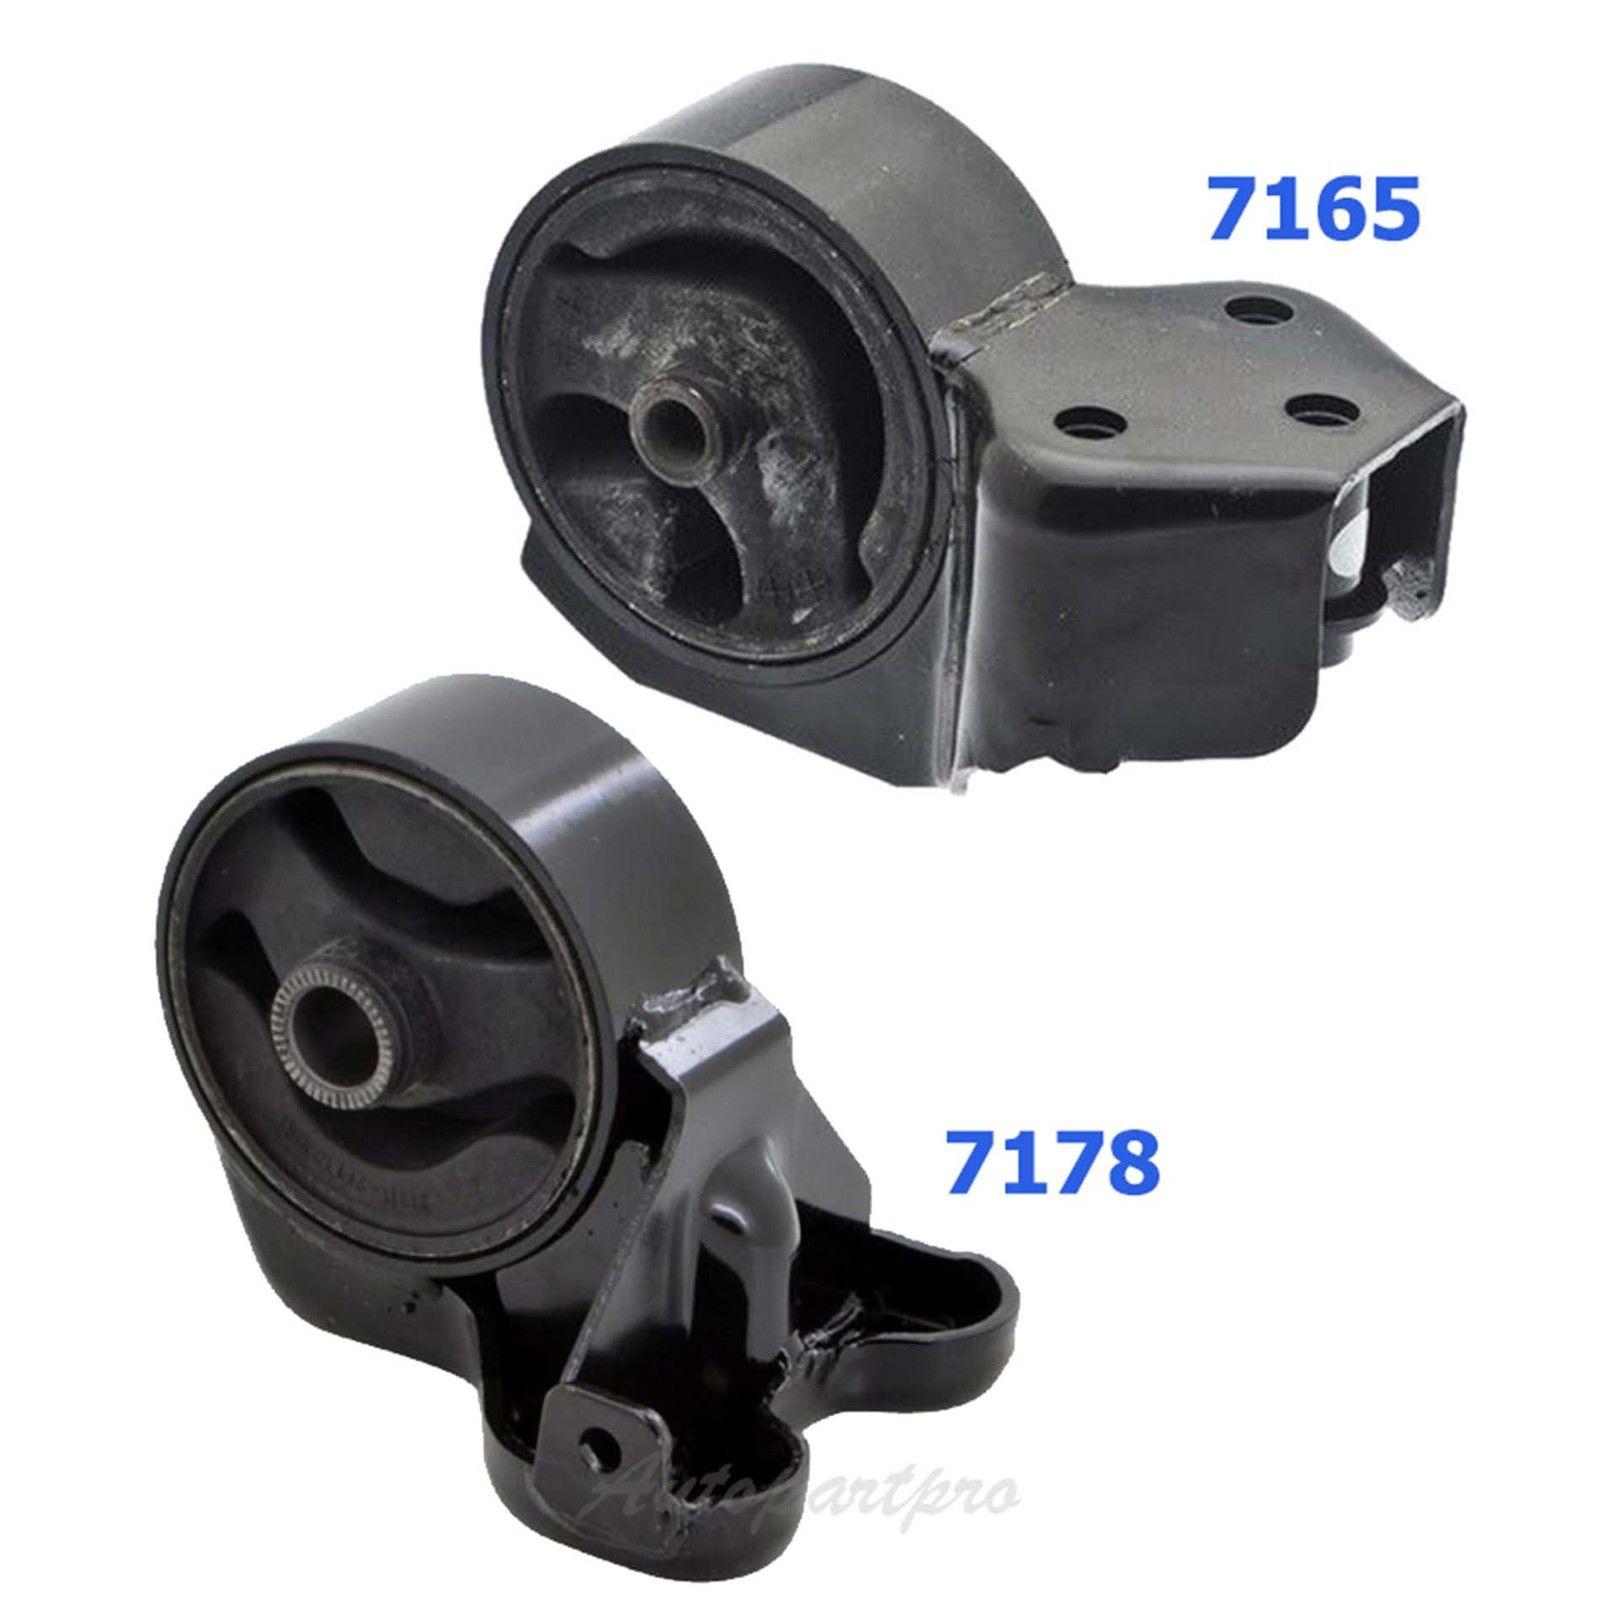 Engine Motor Mount 2PCS 7178 7165 M1268 For 2007-2009 Kia Spectra Spectra5 2.0L